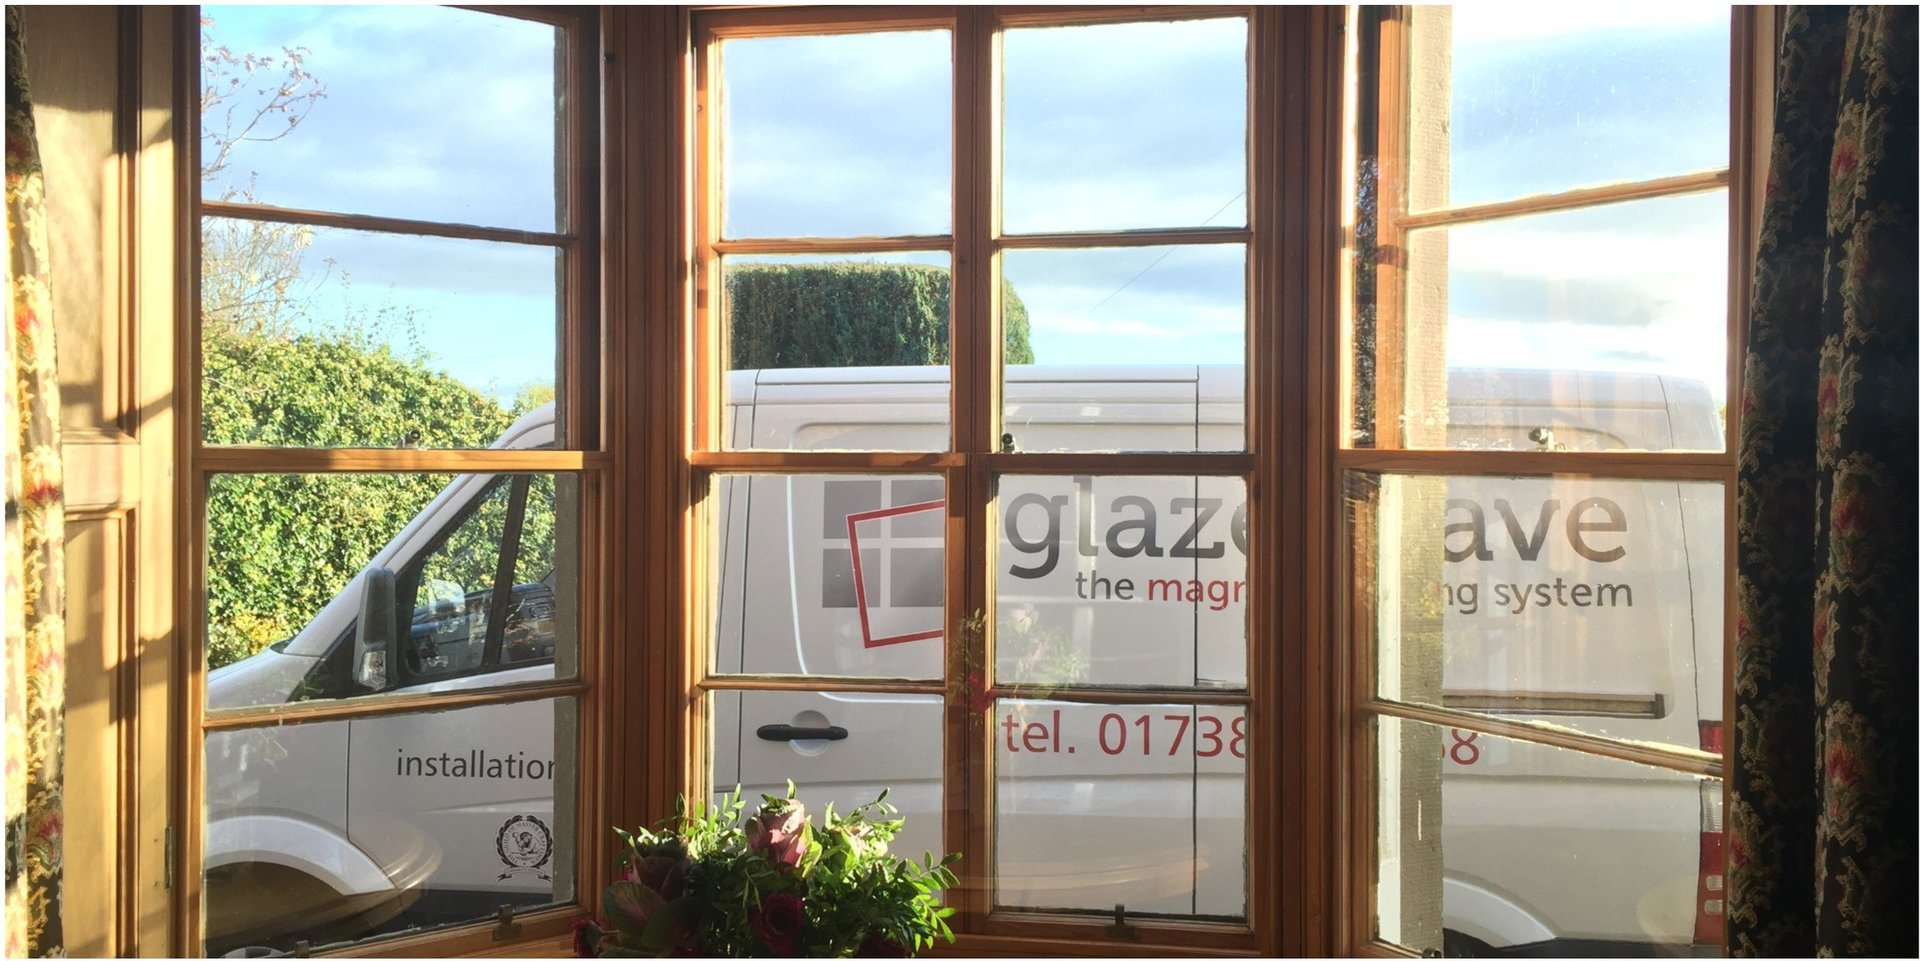 bespoke professional slimline secondary glazing and soundproofing